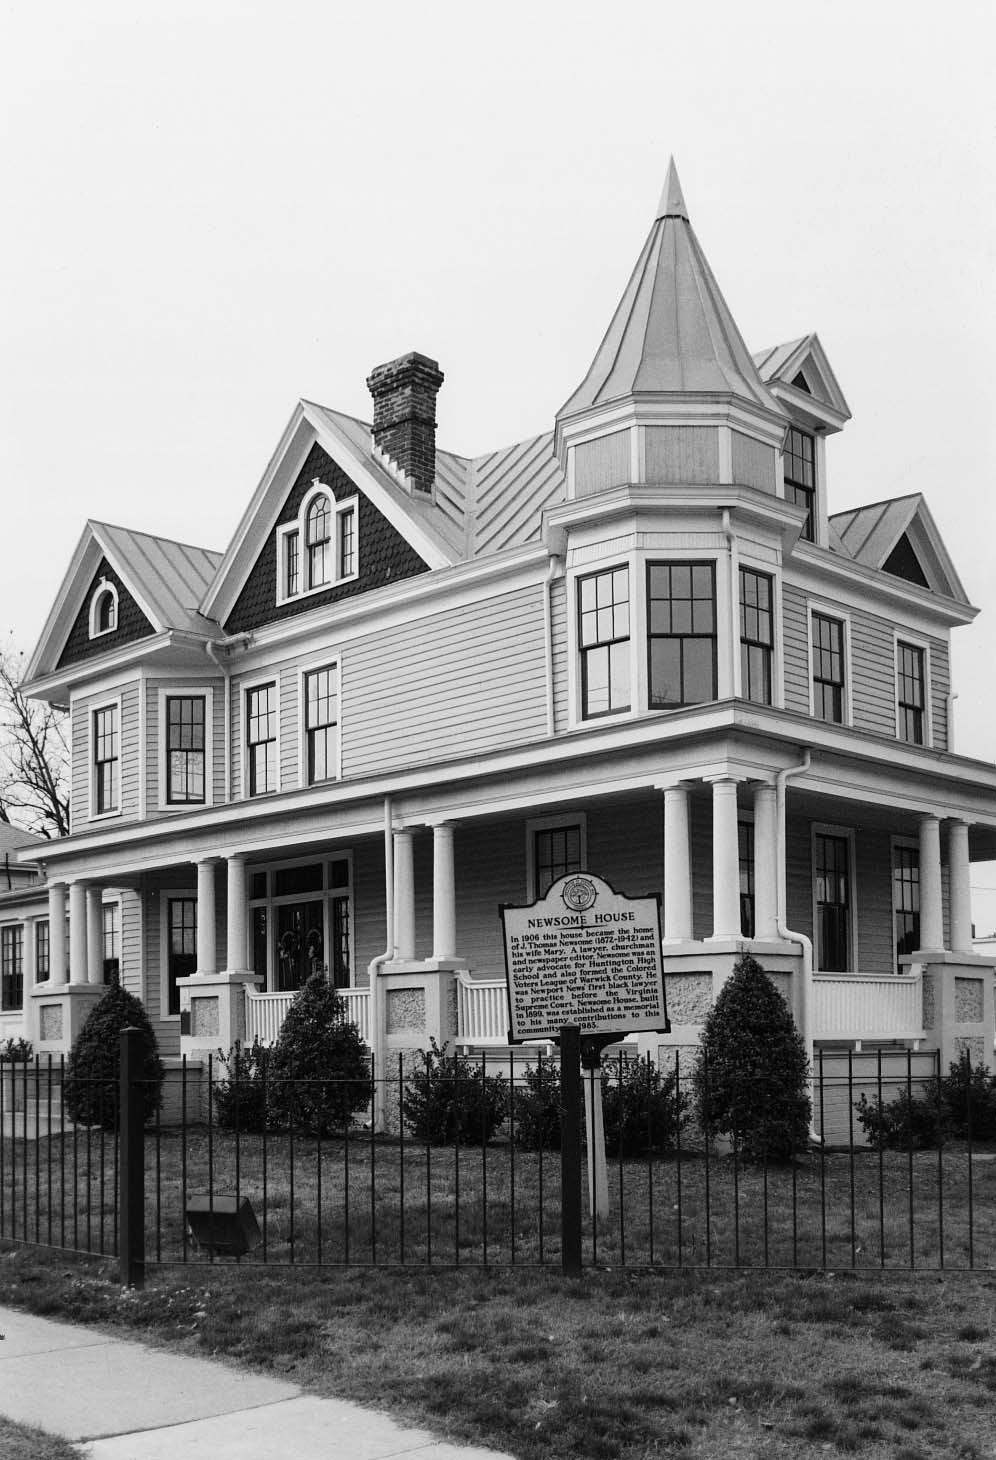 J. Thomas Newsome House